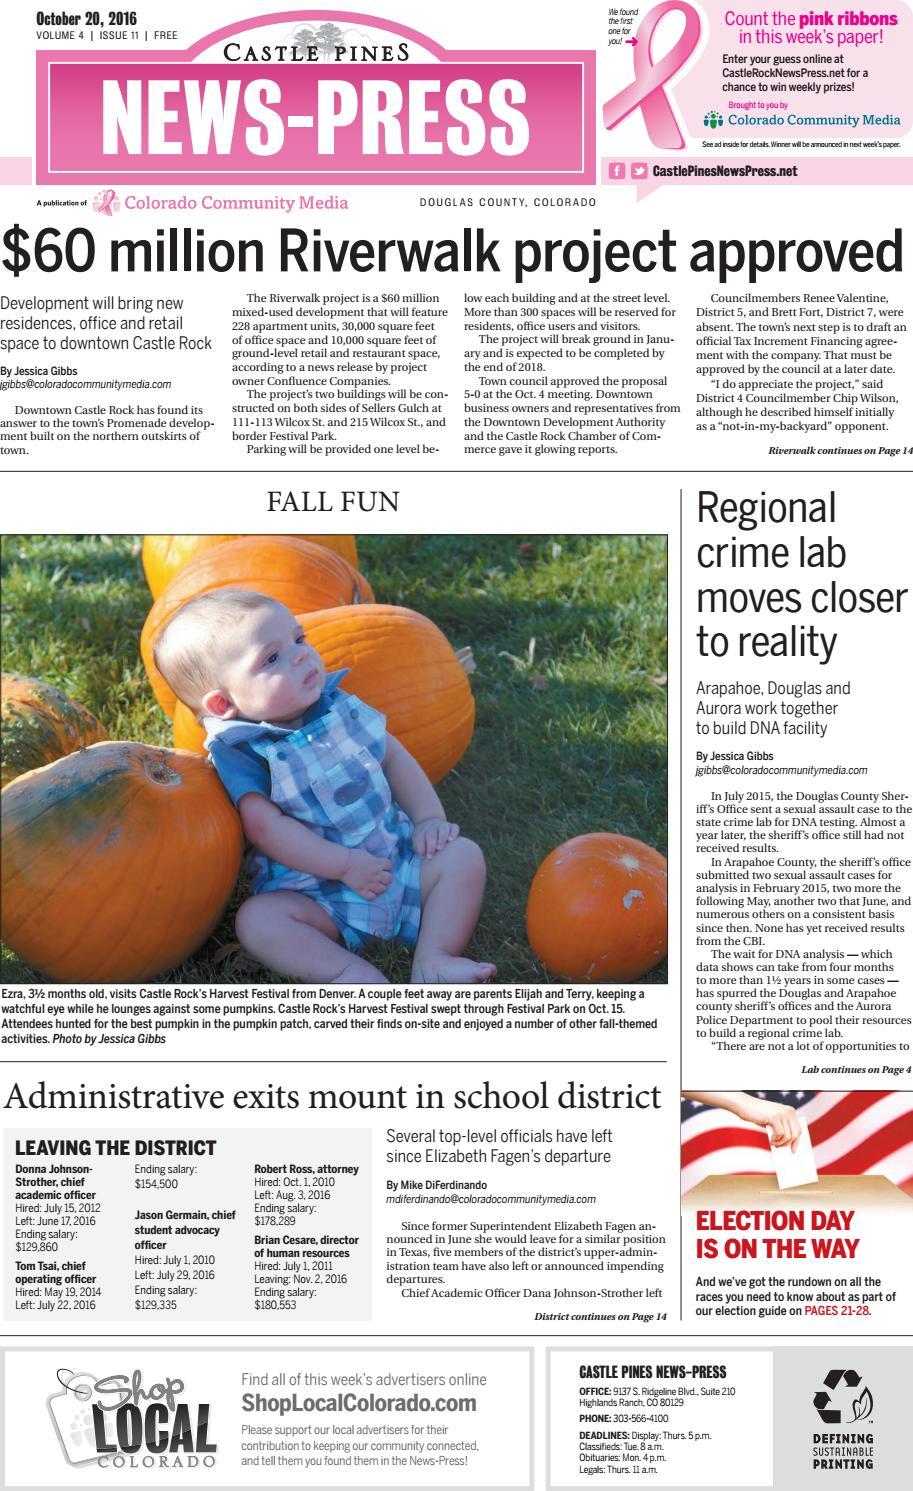 Castle Pines News-Press 1020 by Colorado Community Media - issuu